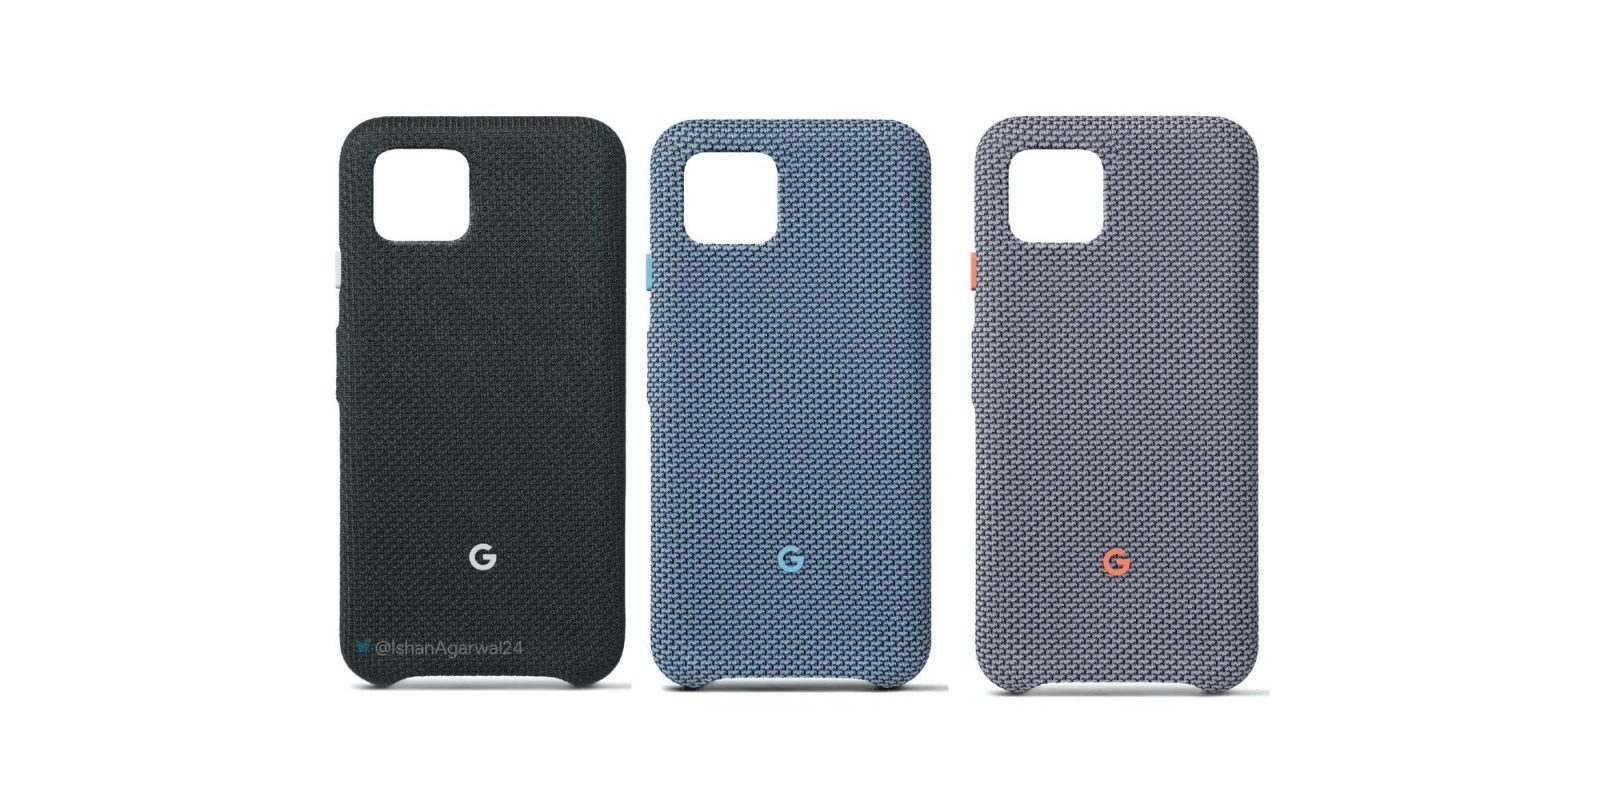 Pixel 4's official fabric cases leak w/ a new blue color, orange accents